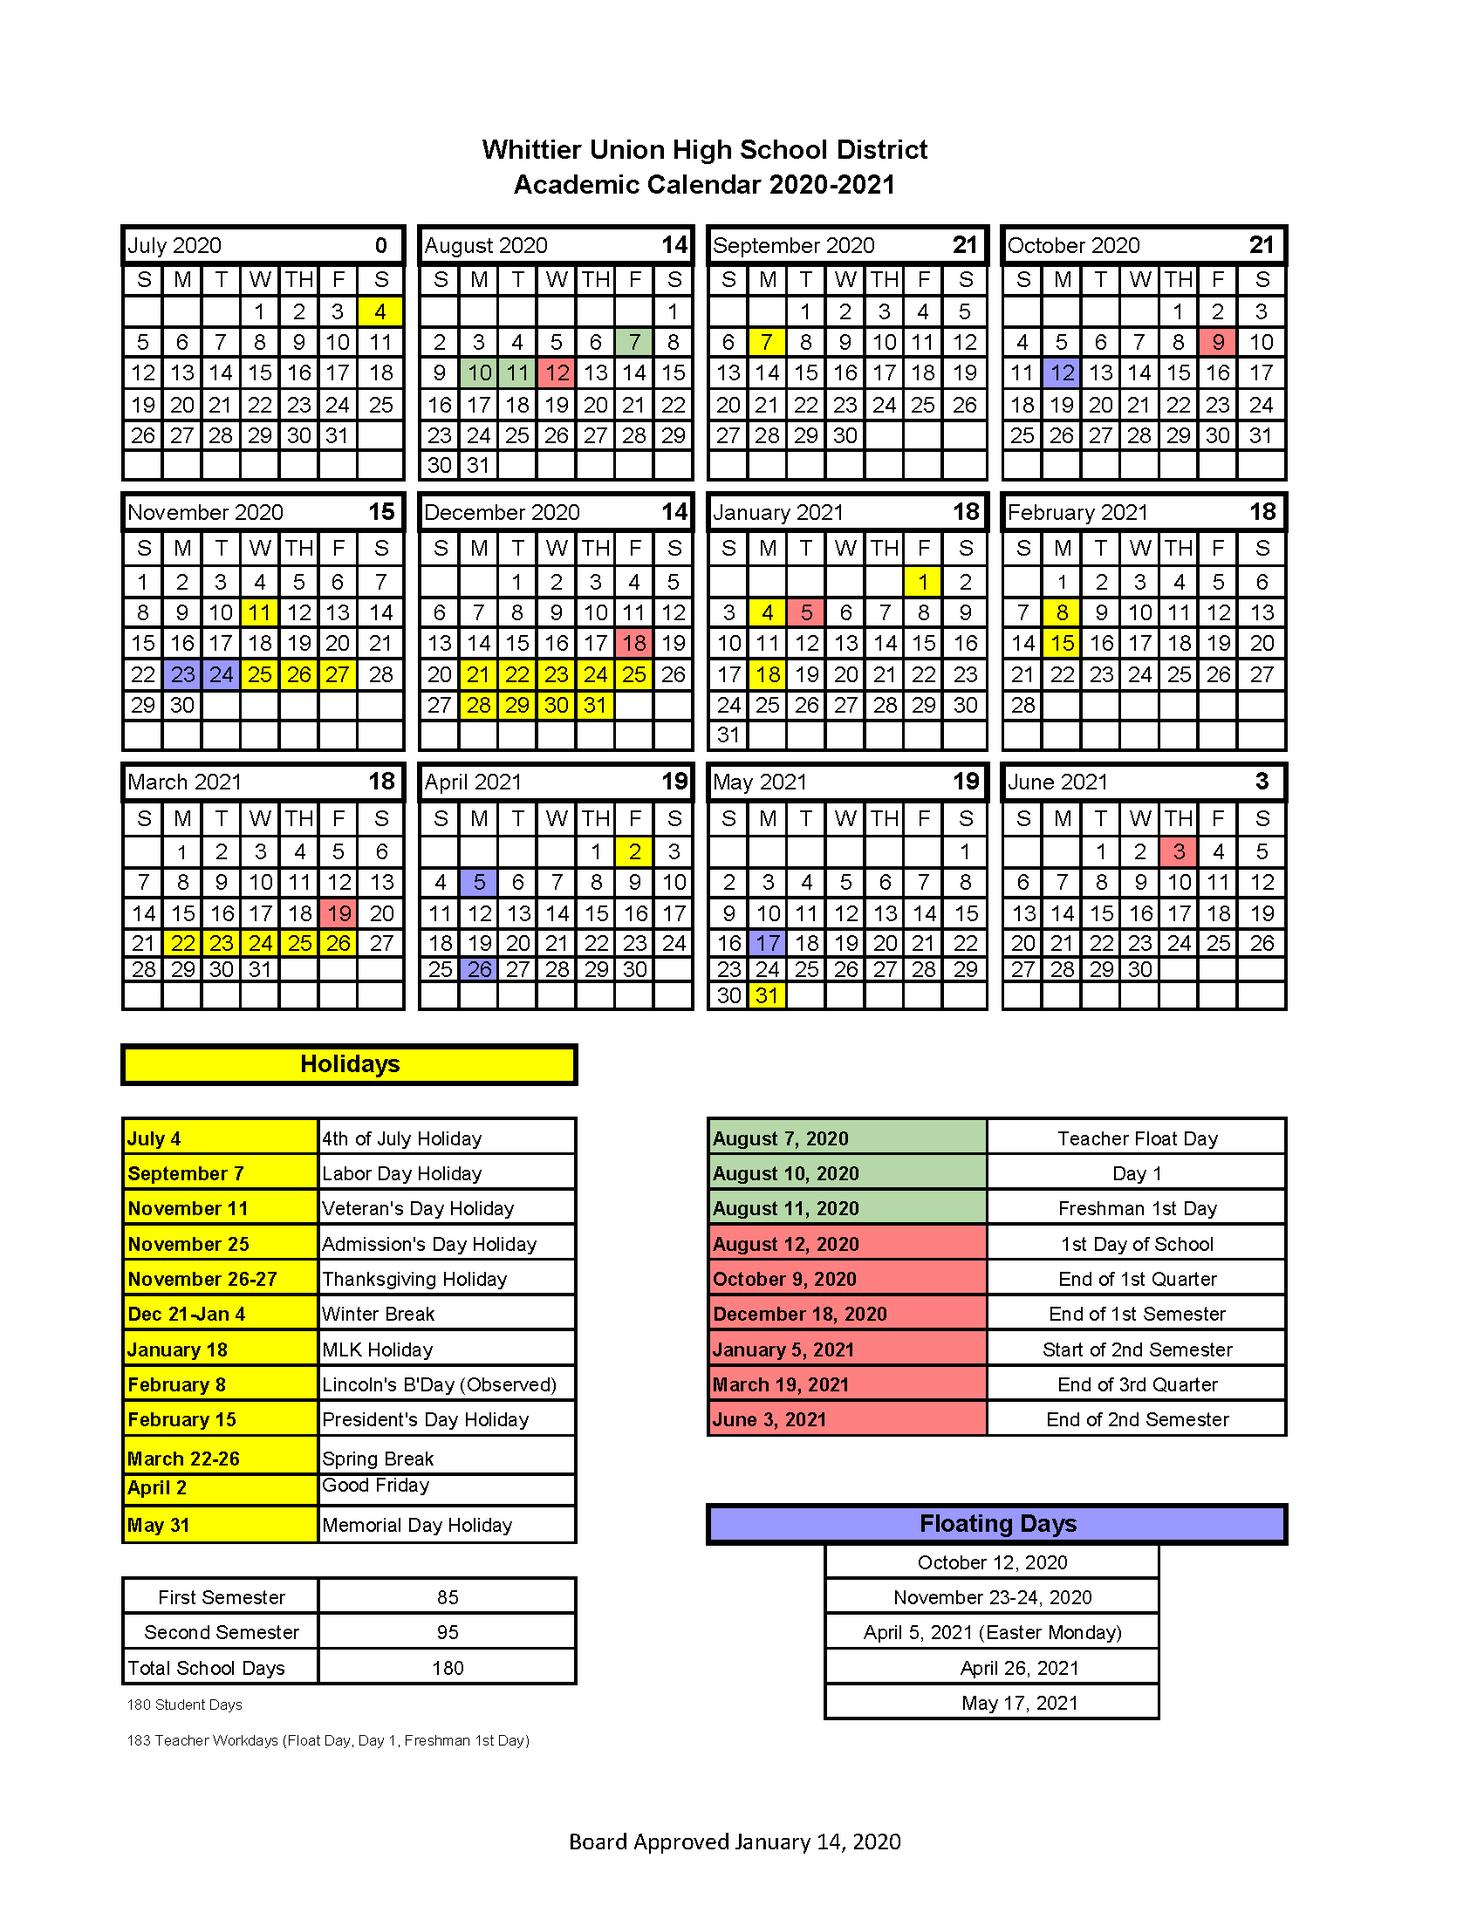 Santa Fe Public Schools Calendar | Printable Calendar 2020 regarding Las Cruces Public Schools Calendar 2021 2020